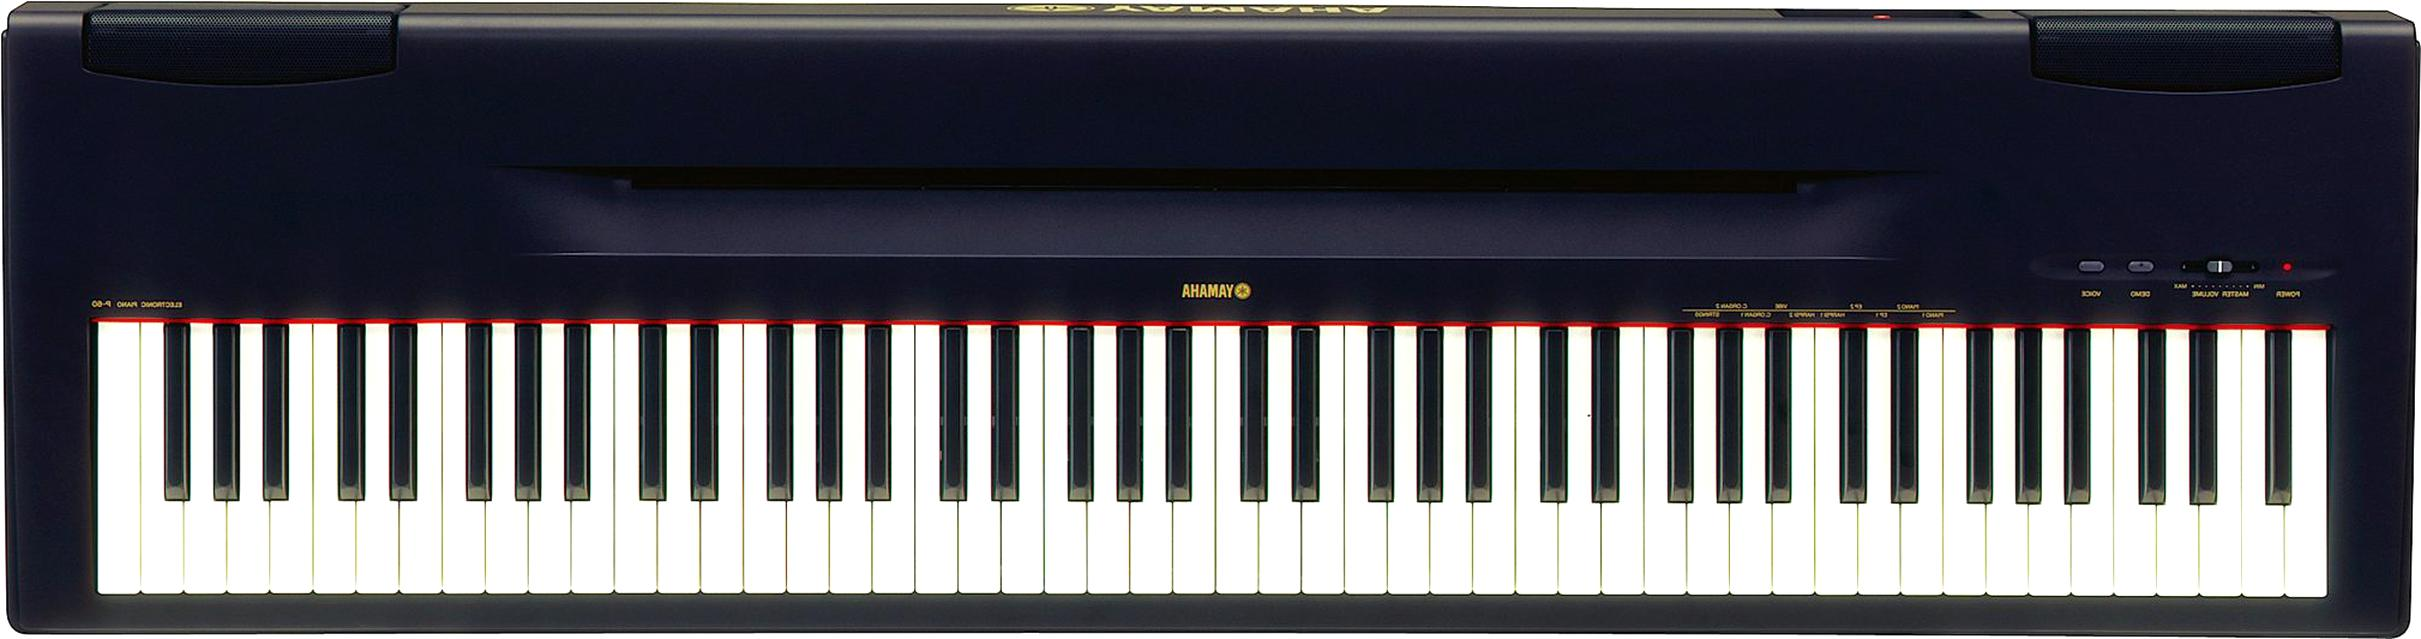 piano yamaha p60 d'occasion